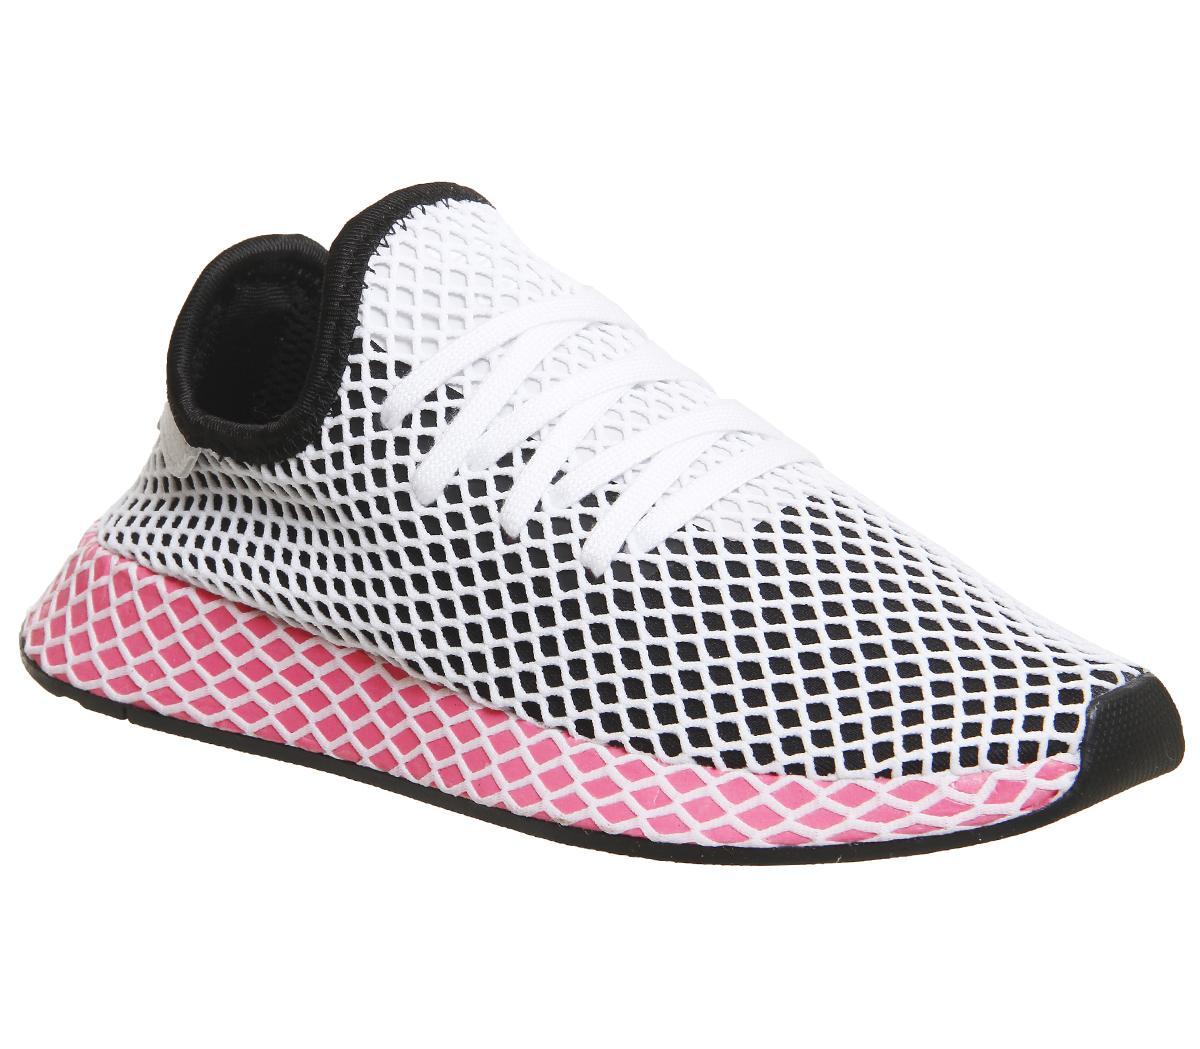 adidas Deerupt Trainers Core Black